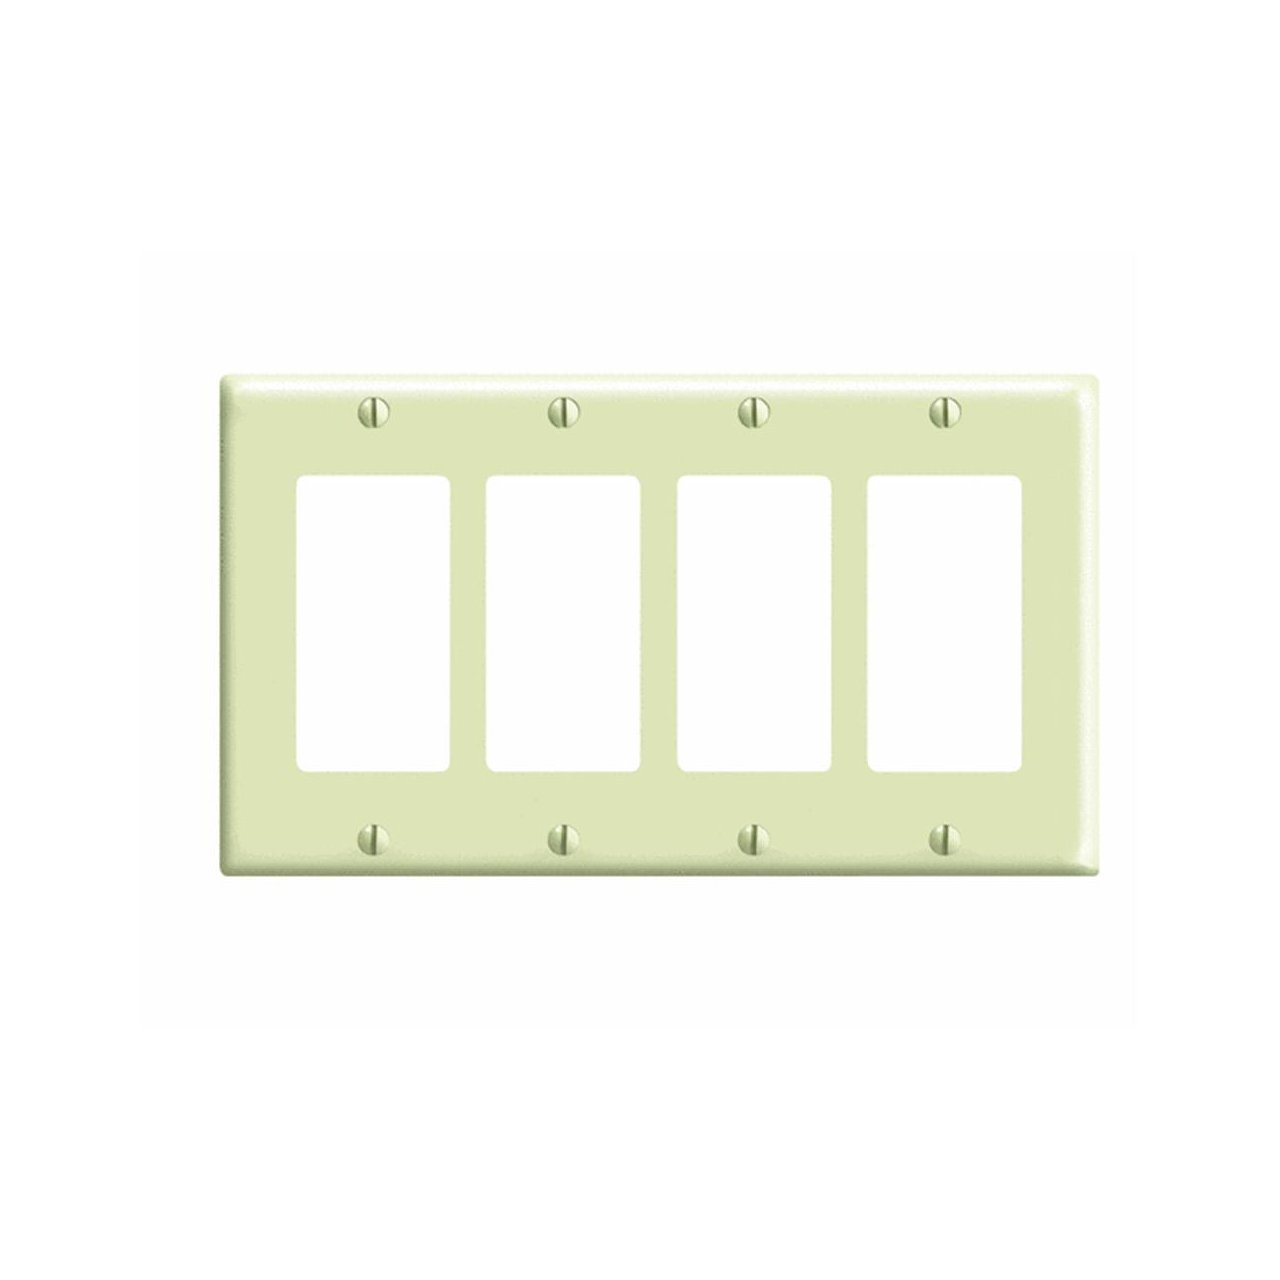 Luxury Gang Decorator Wall Plate Mold - Art & Wall Decor - hecatalog ...